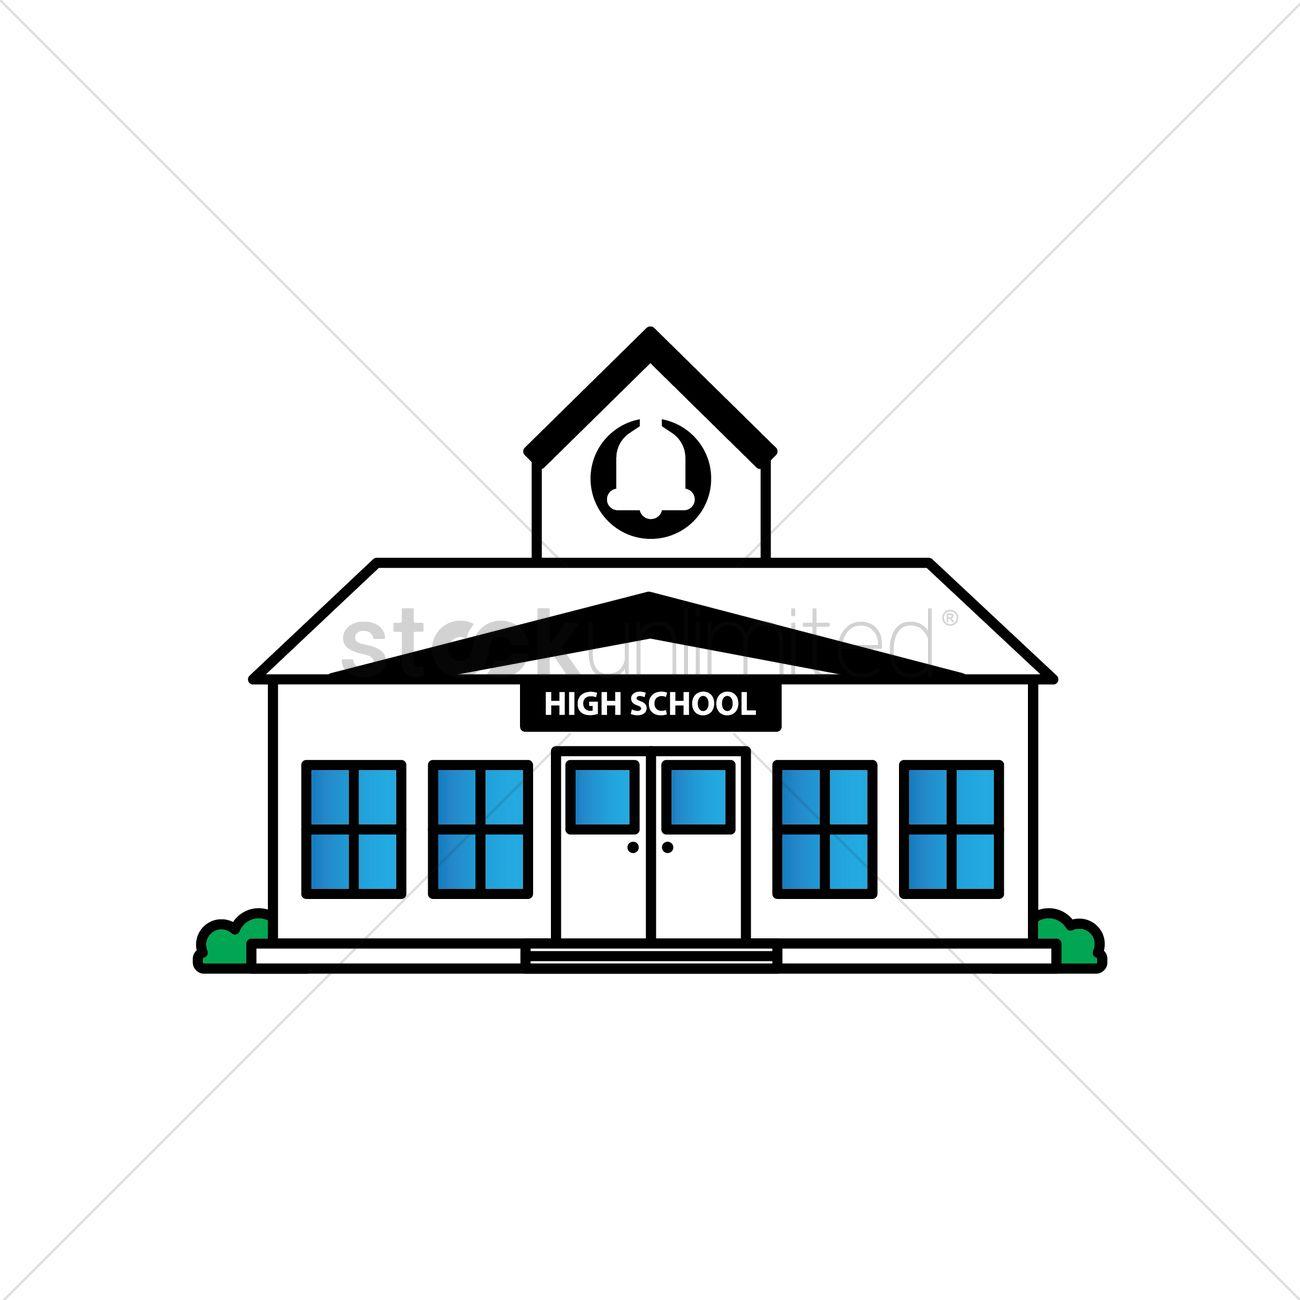 School building vector clipart clipart stock Free High school building Vector Image - 1623541 ... clipart stock